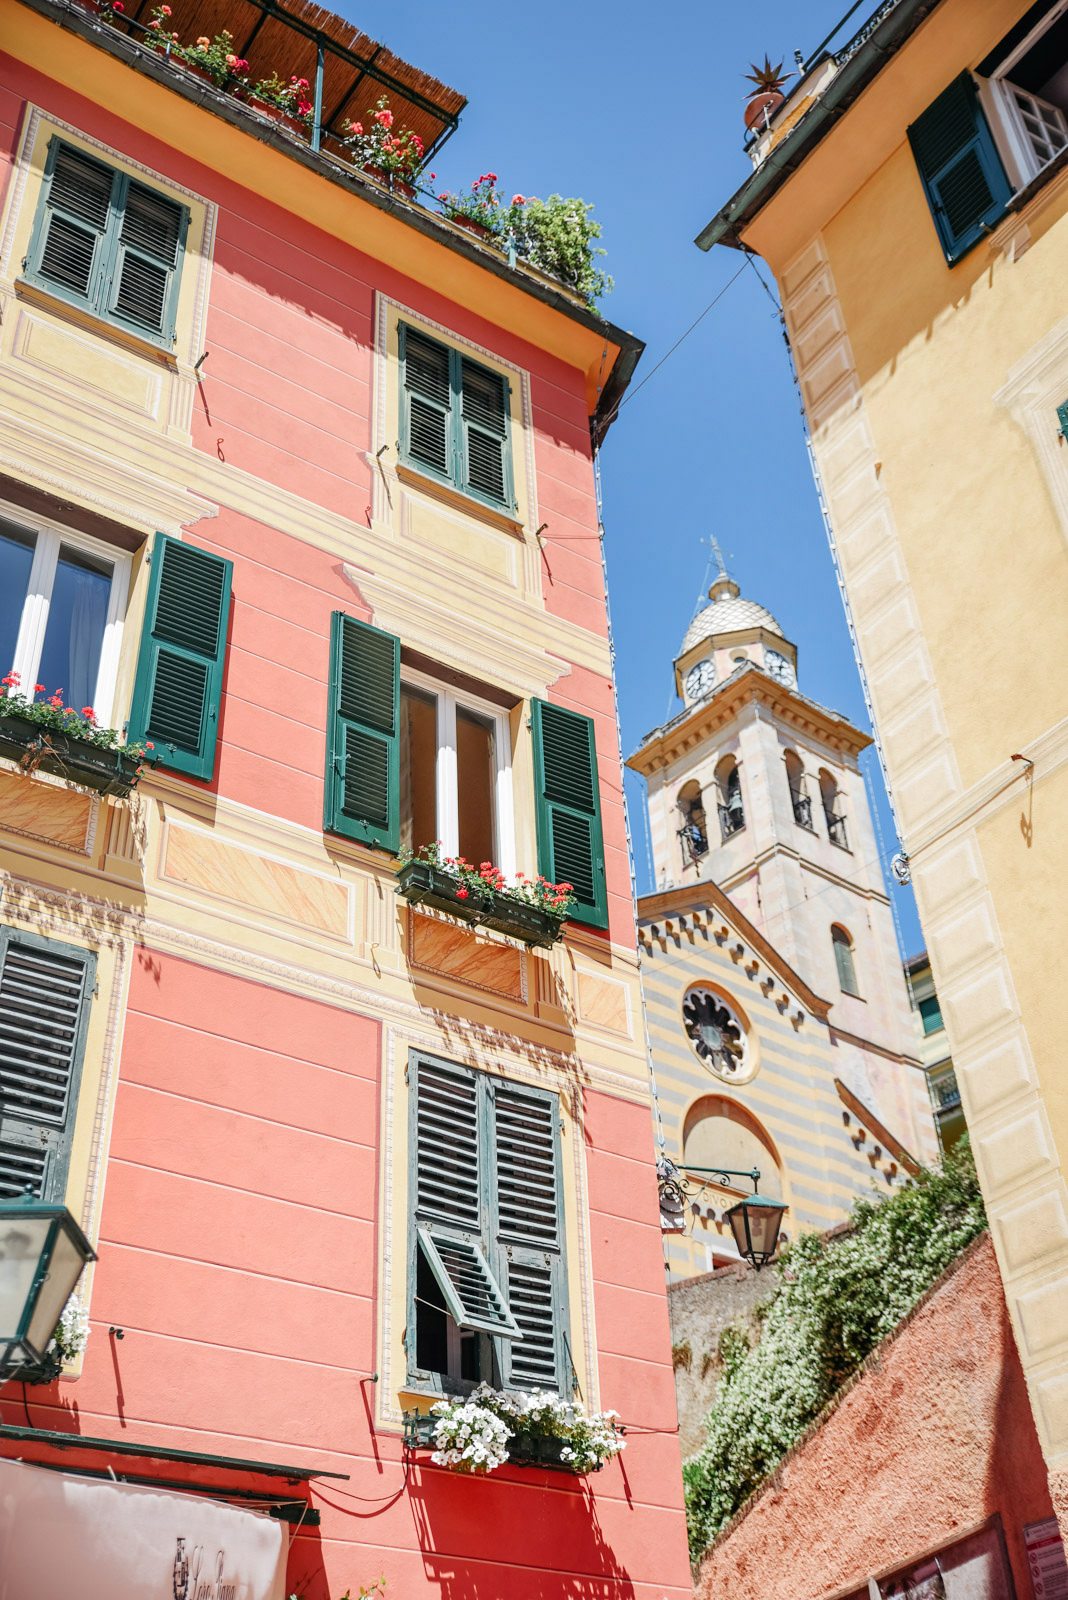 Blog-Mode-And-The-City-Lifestyle-Italie-Portofino-Belmond-Hotel-6